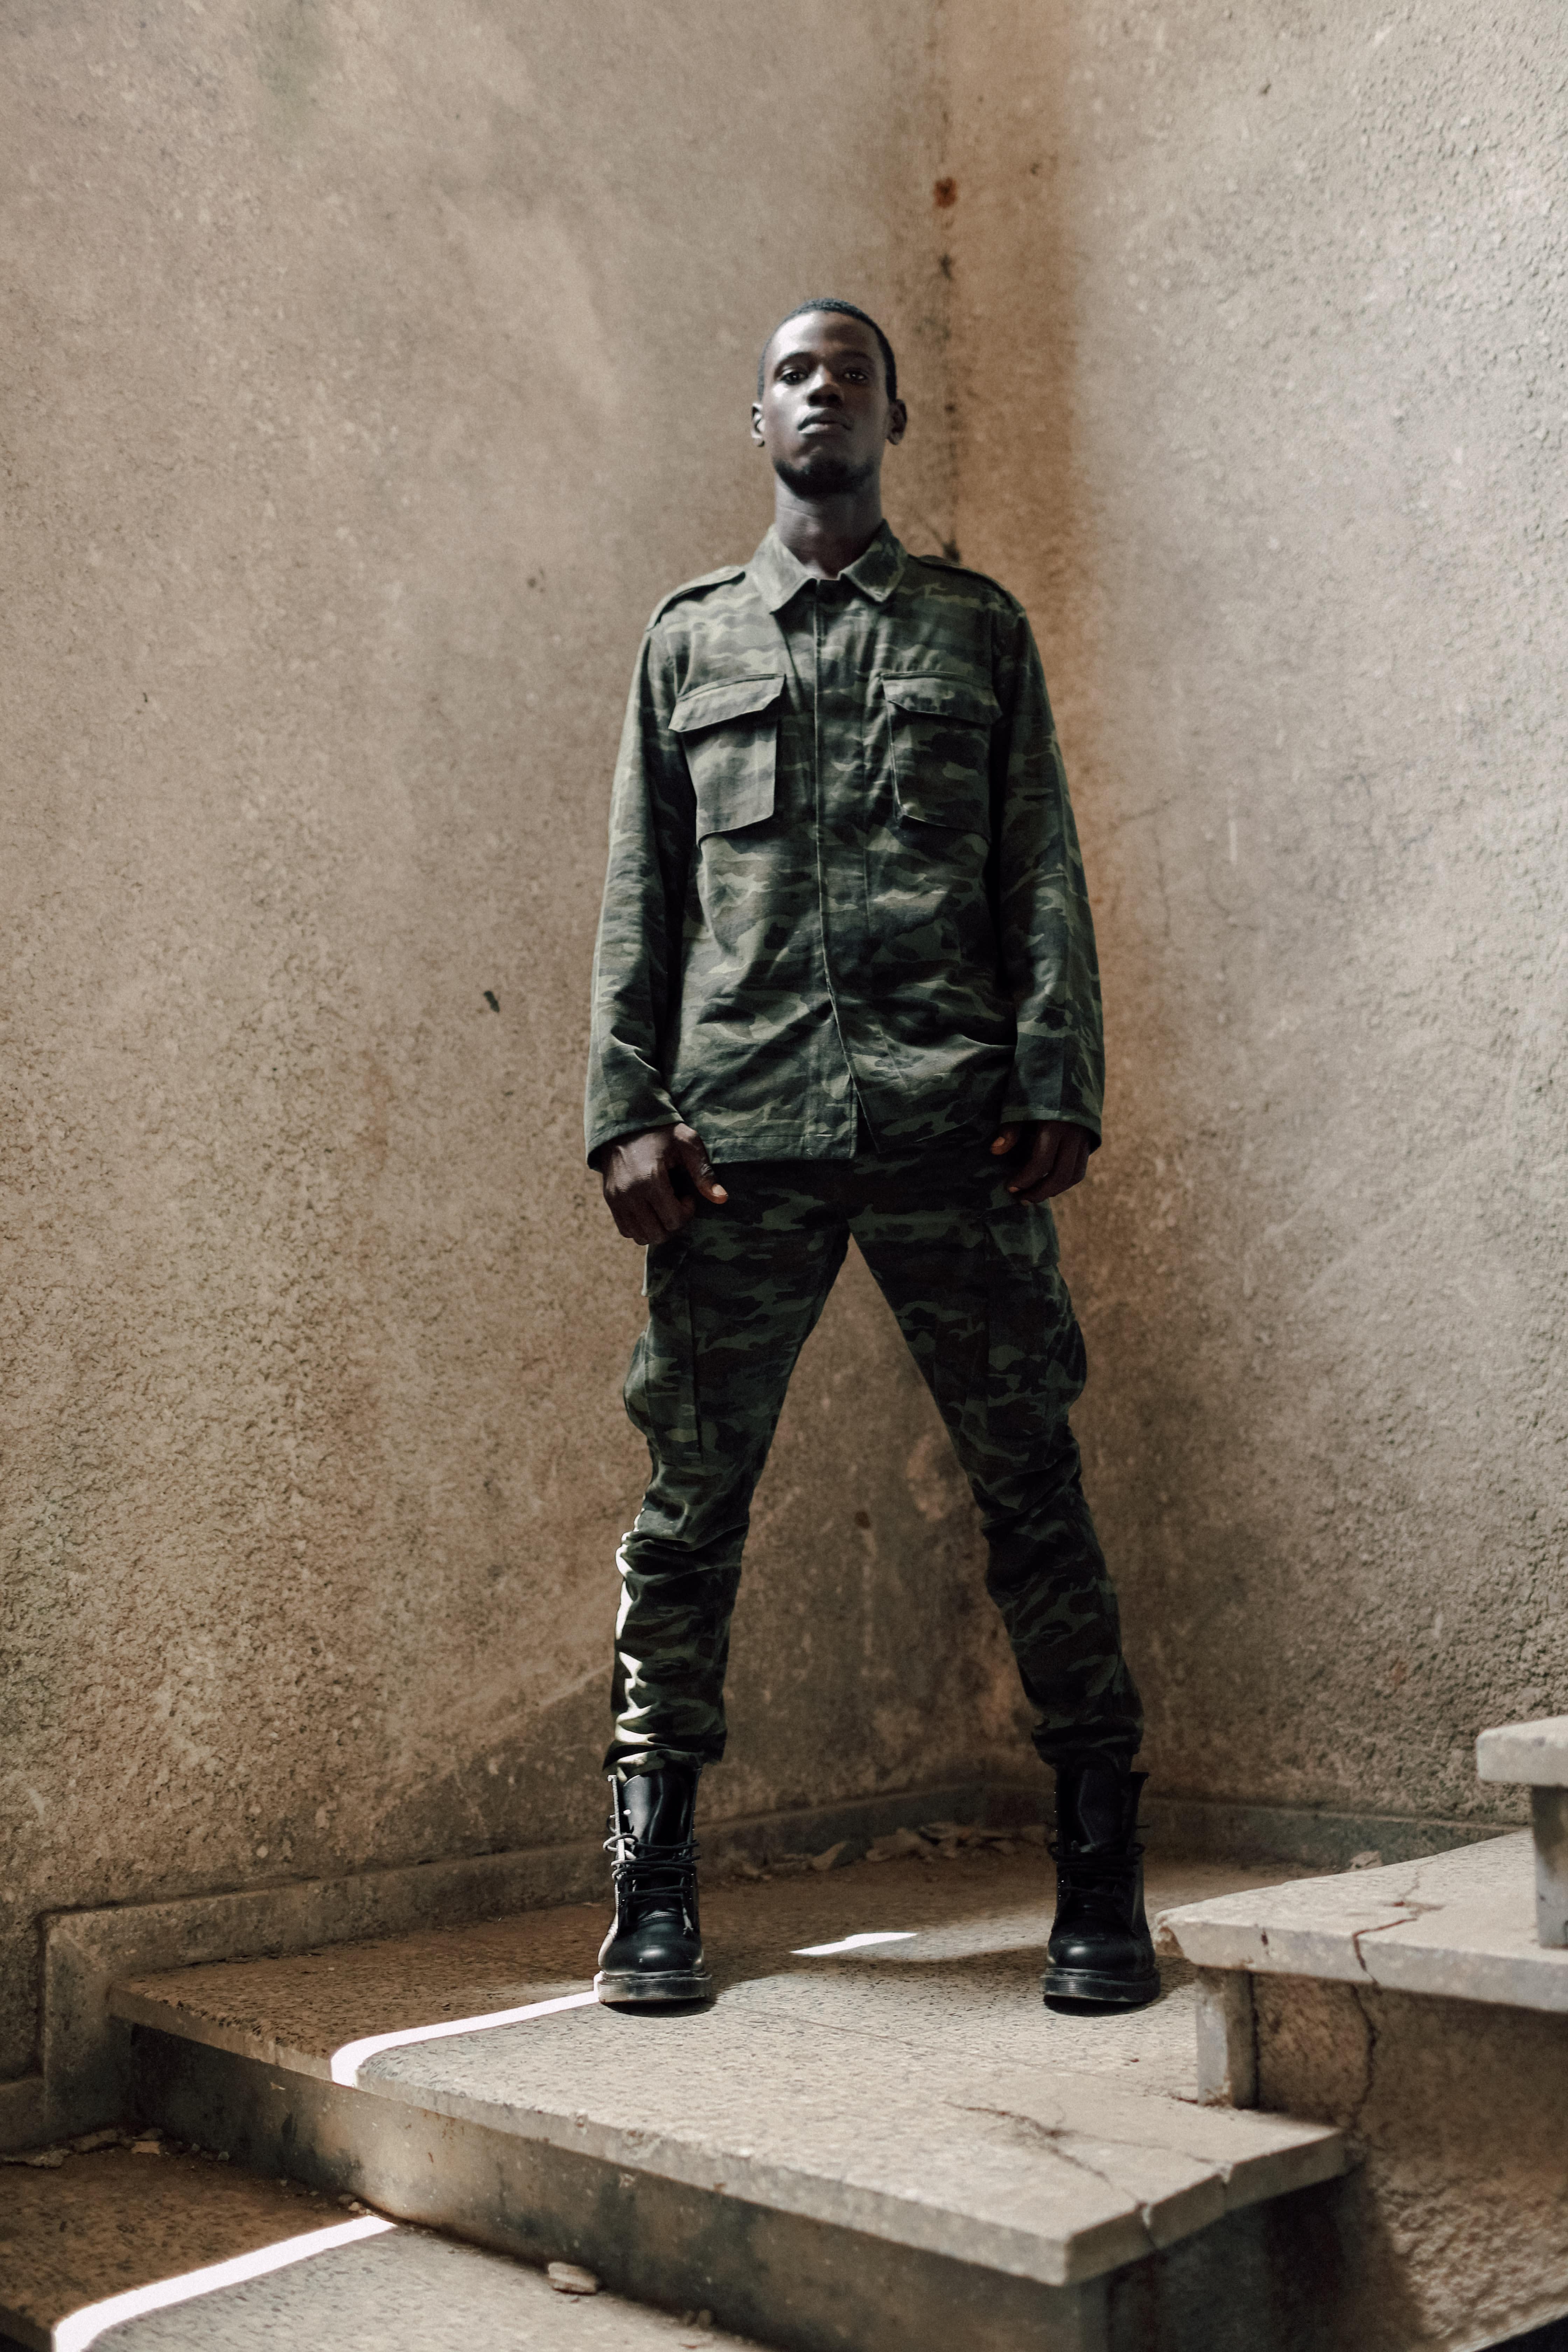 ASAP Ferg Traplord x Uniform collaboration